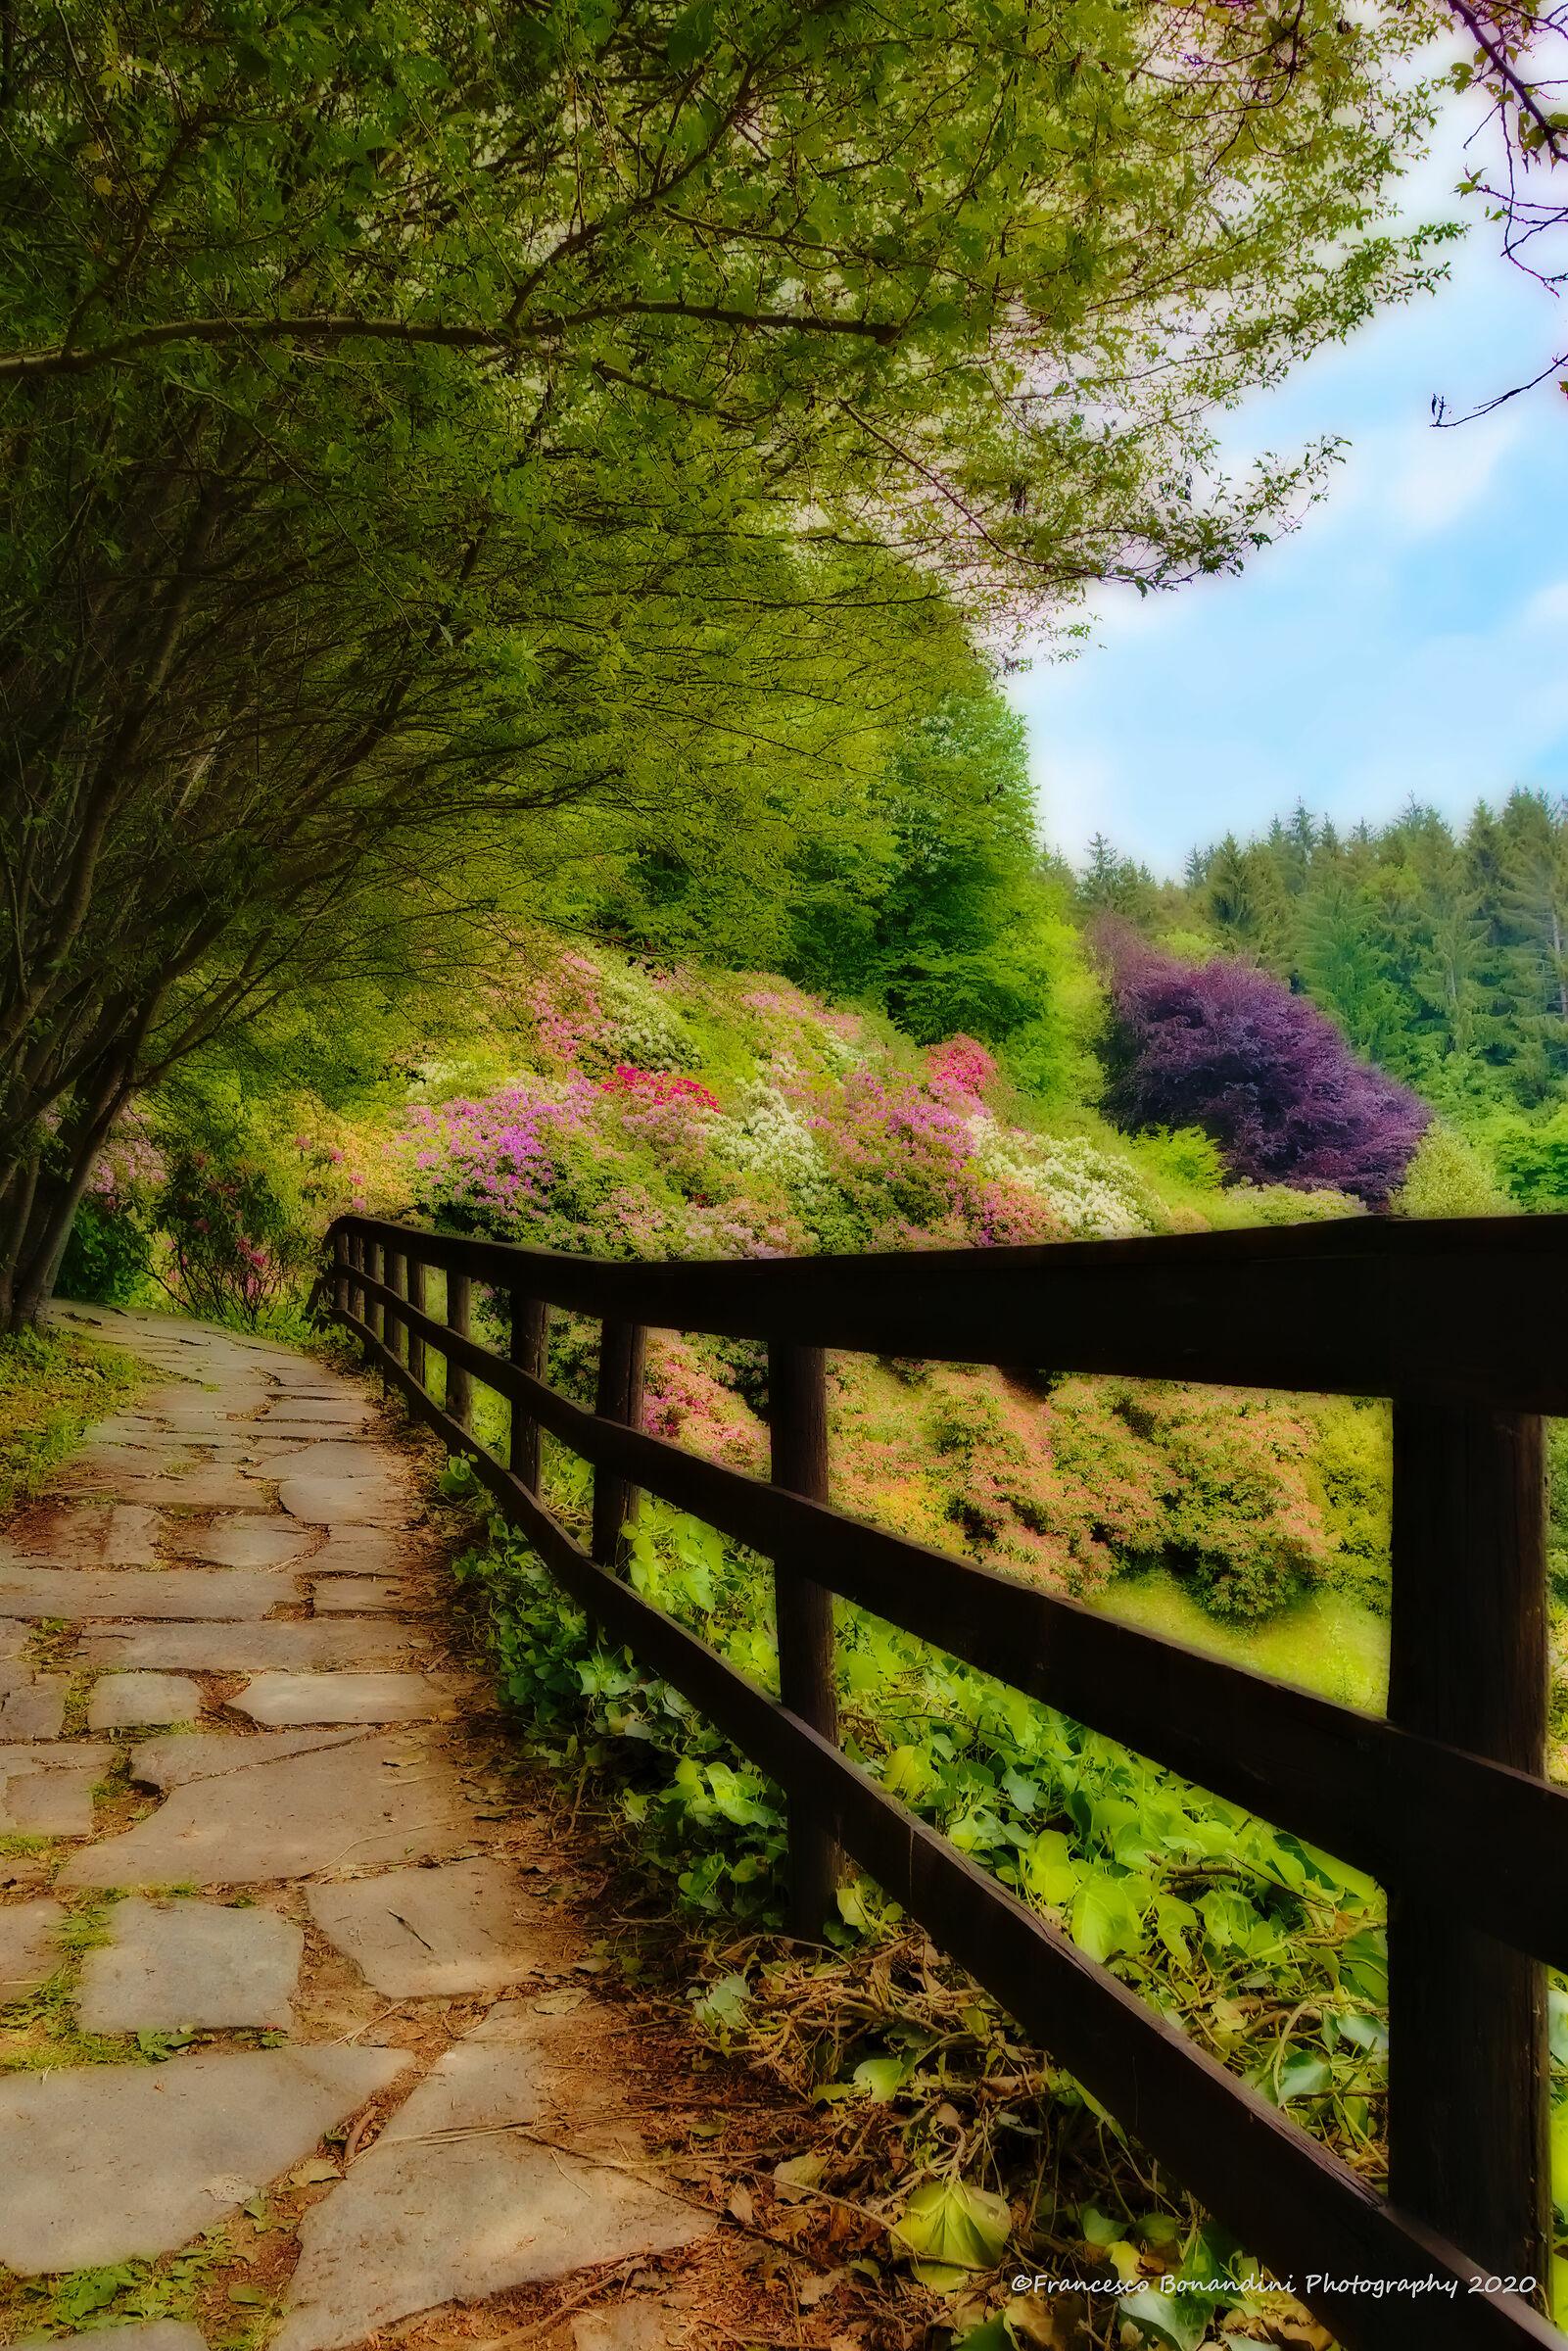 Walk among the flowers...